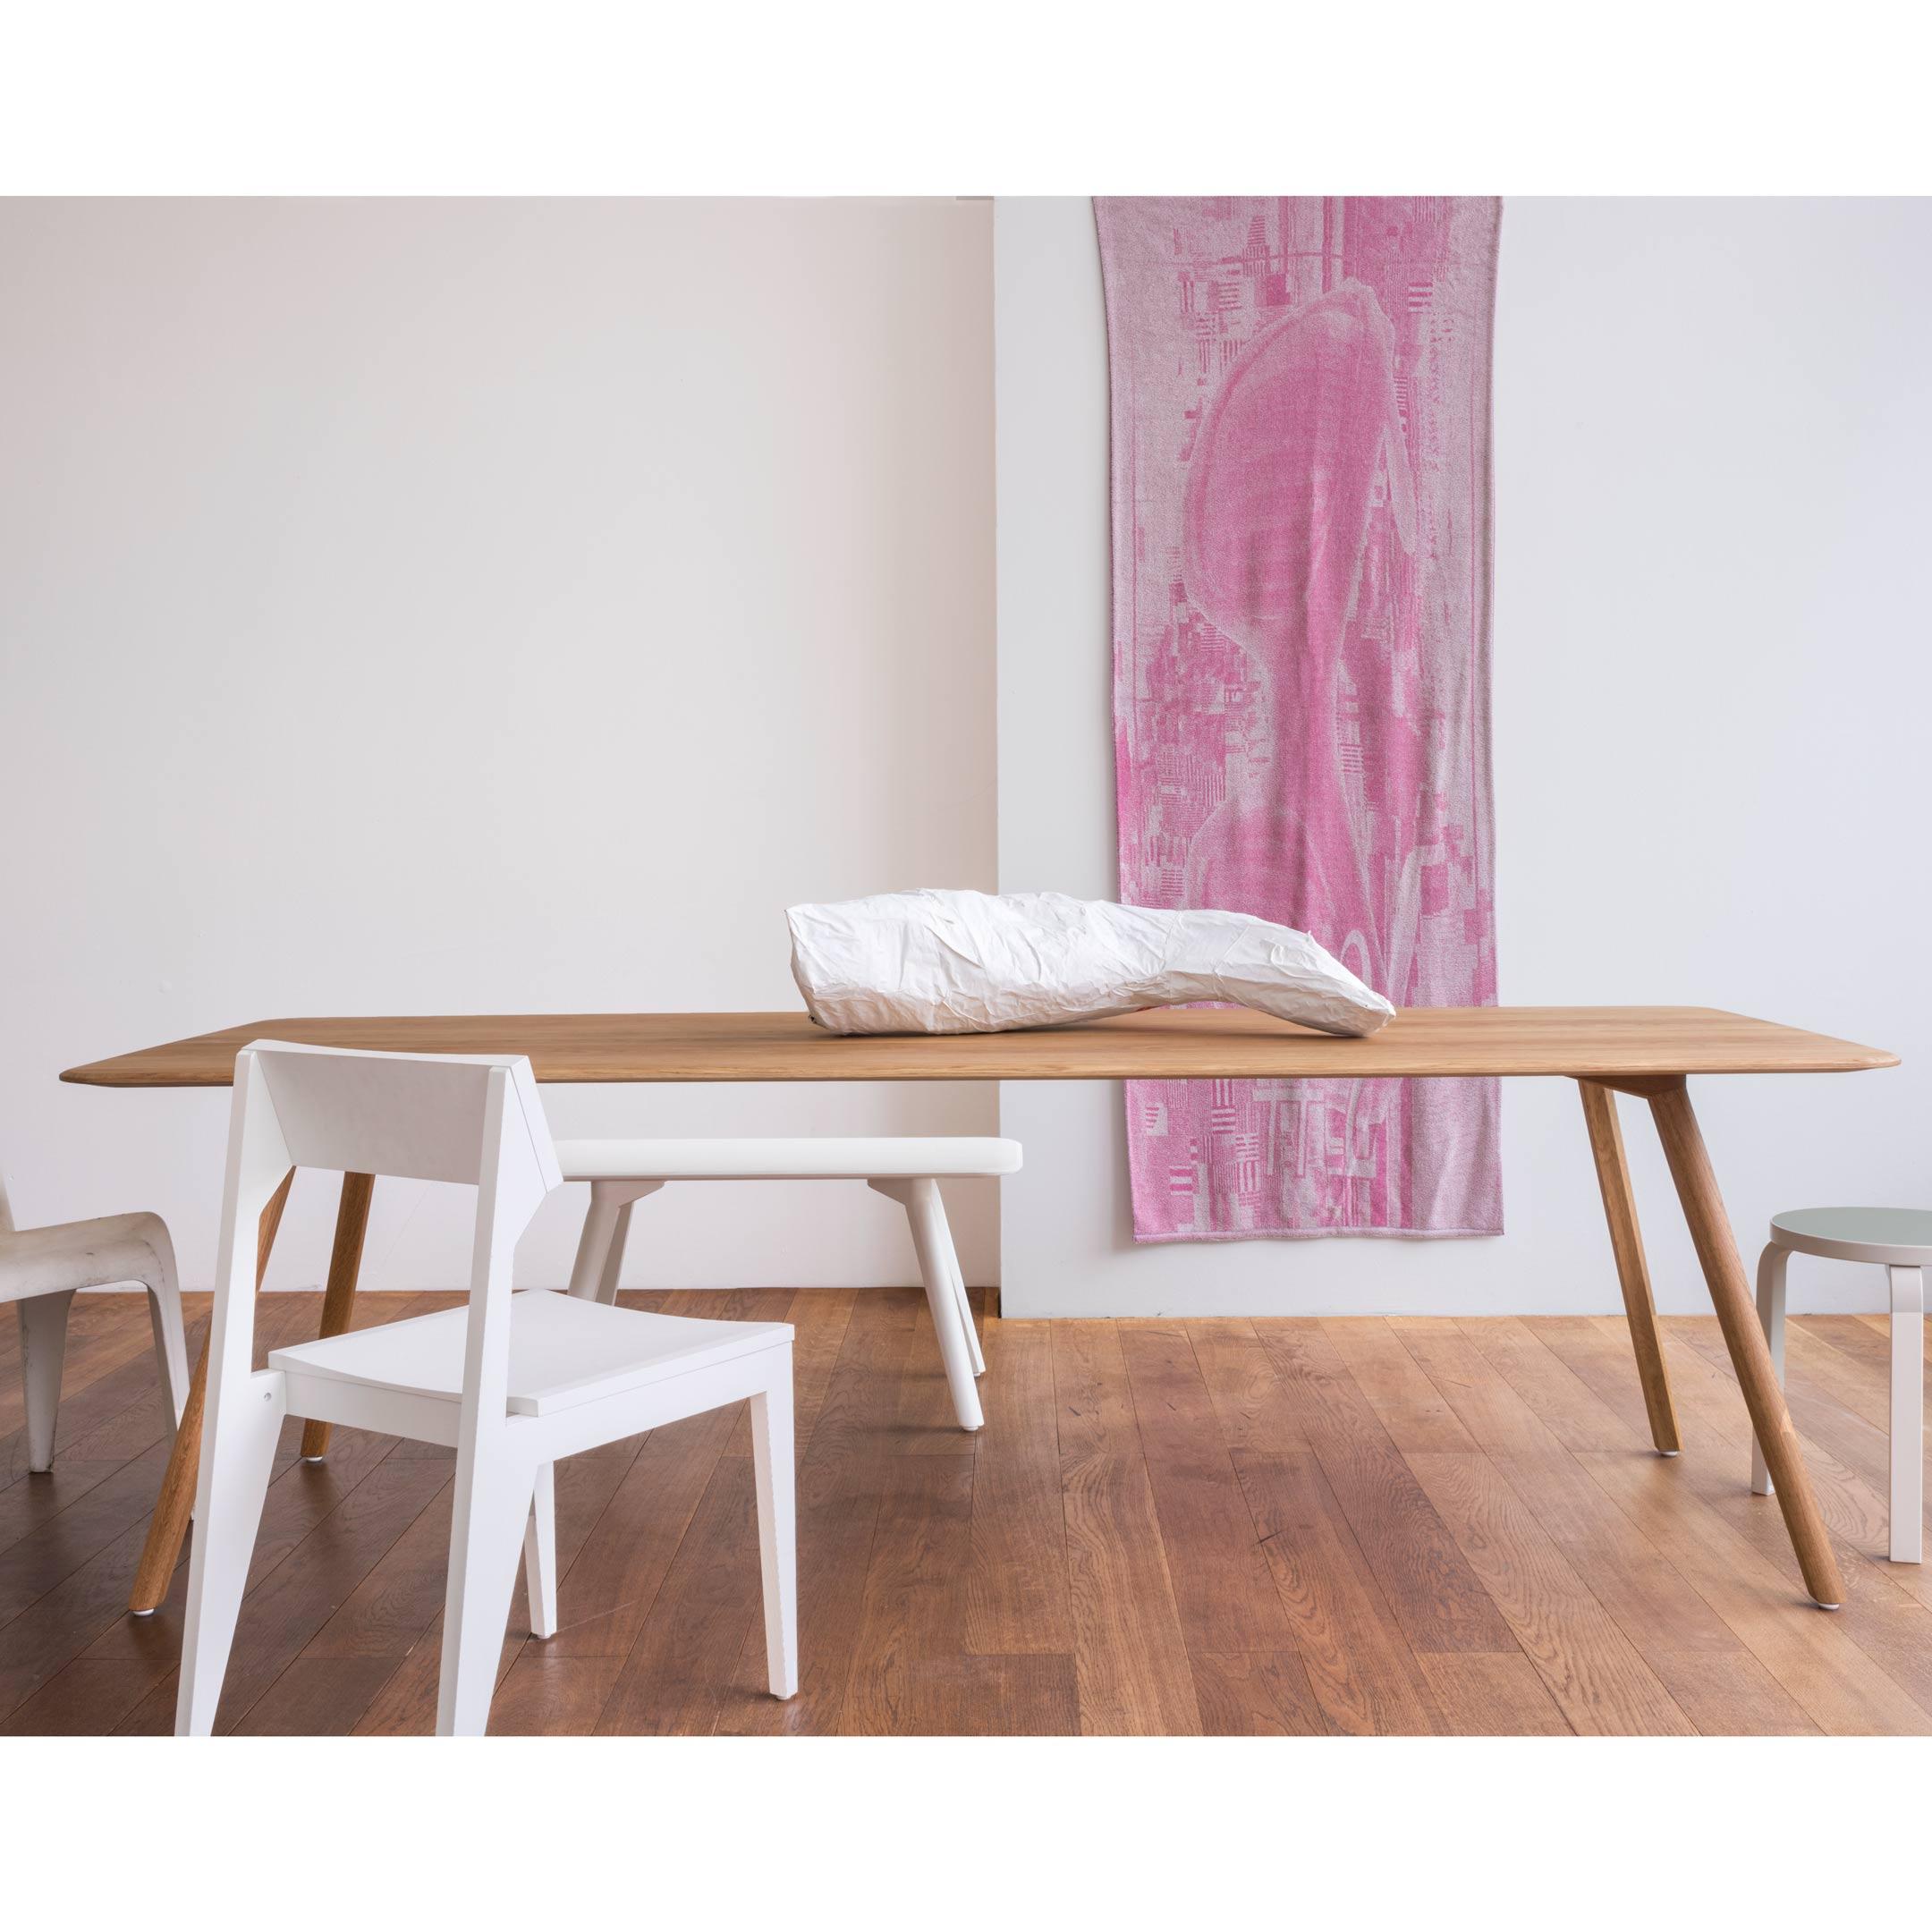 Objekte unserer Tage Tisch Meyer   Möbel Bär AG